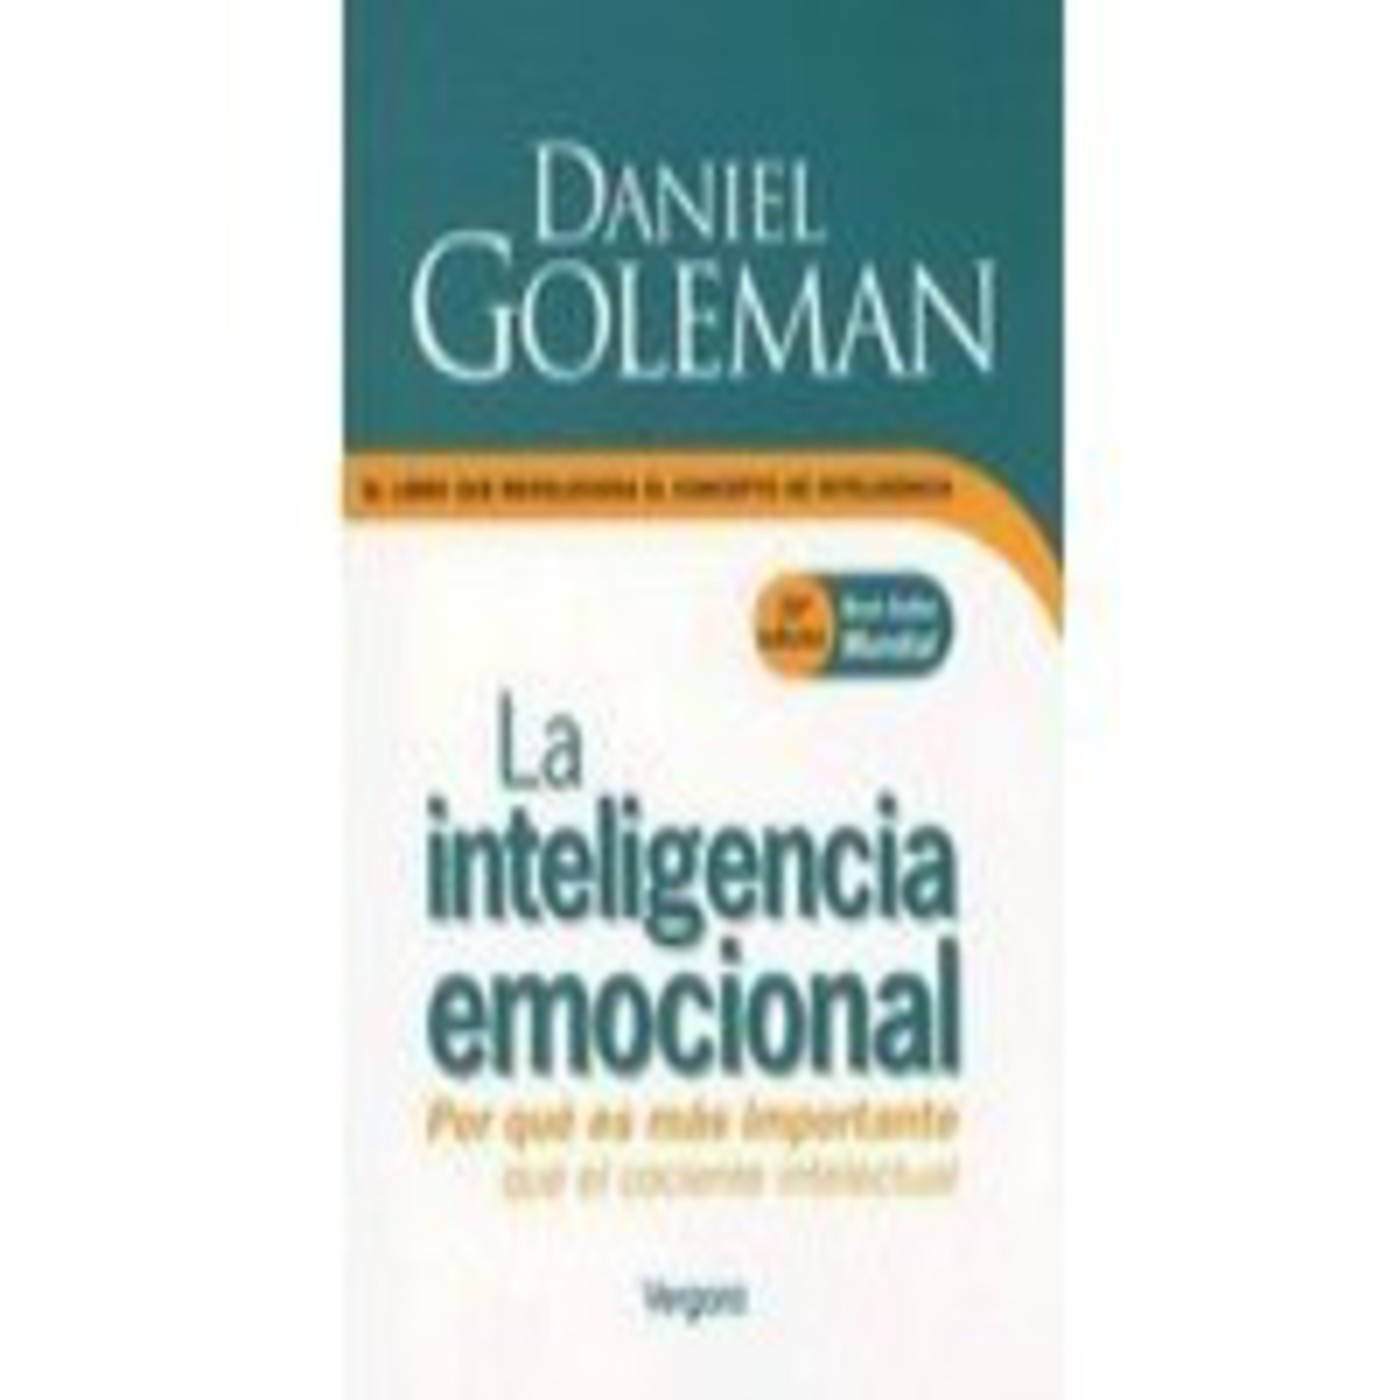 45..INTELIGENCIA EMOCIONAL, Daniel Goleman